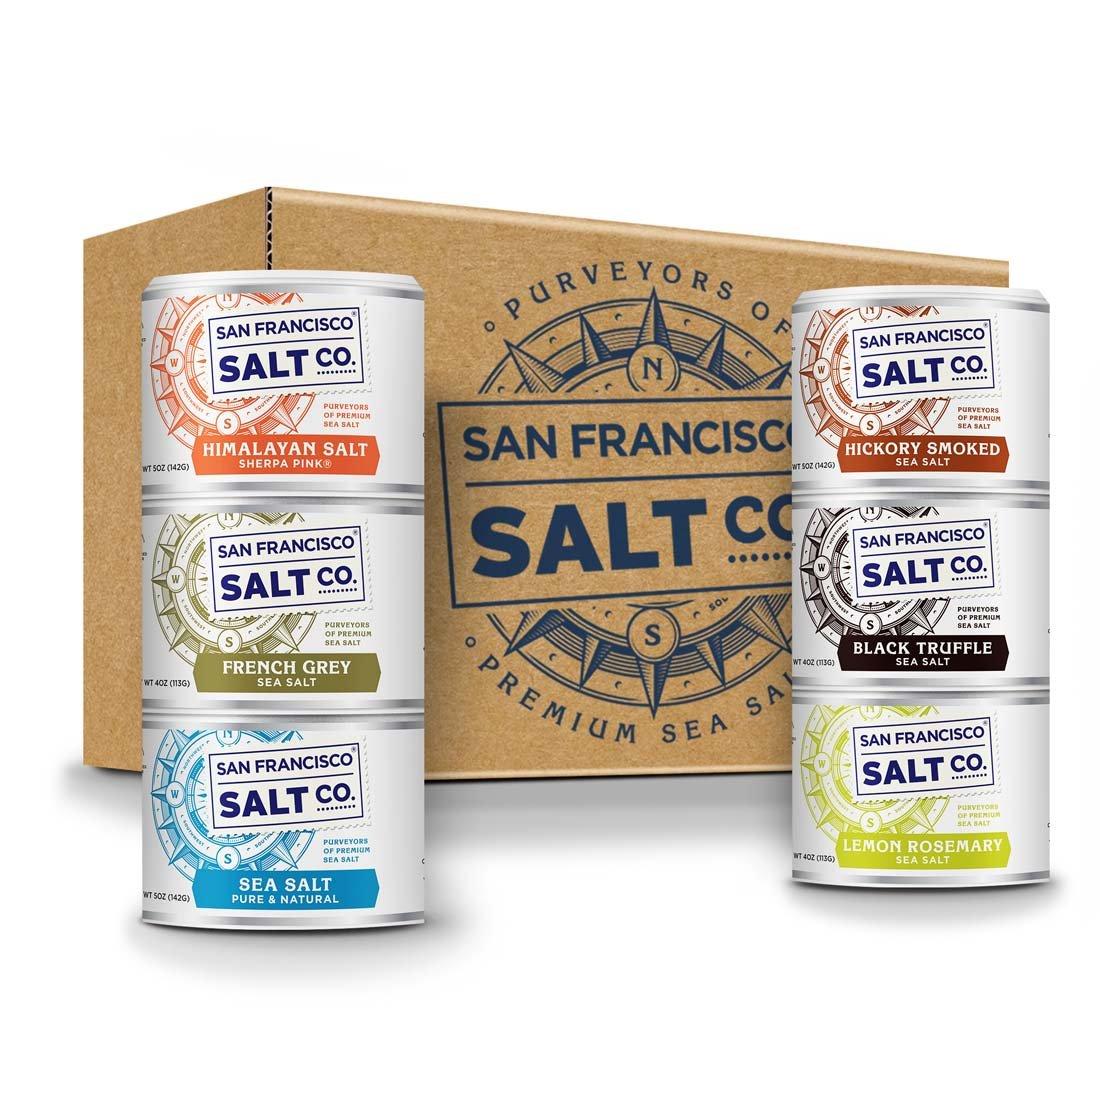 Stackable Salt Shakers – HOME CHEF HERO GIFT SET – Sherpa Pink Himalayan Salt, French Grey Sea Salt, Hickory Smoked Sea Salt, Black Truffle Sea Salt, Pacific Sea Salt, Lemon Rosemary Sea Salt by San Francisco Salt Company (Image #8)